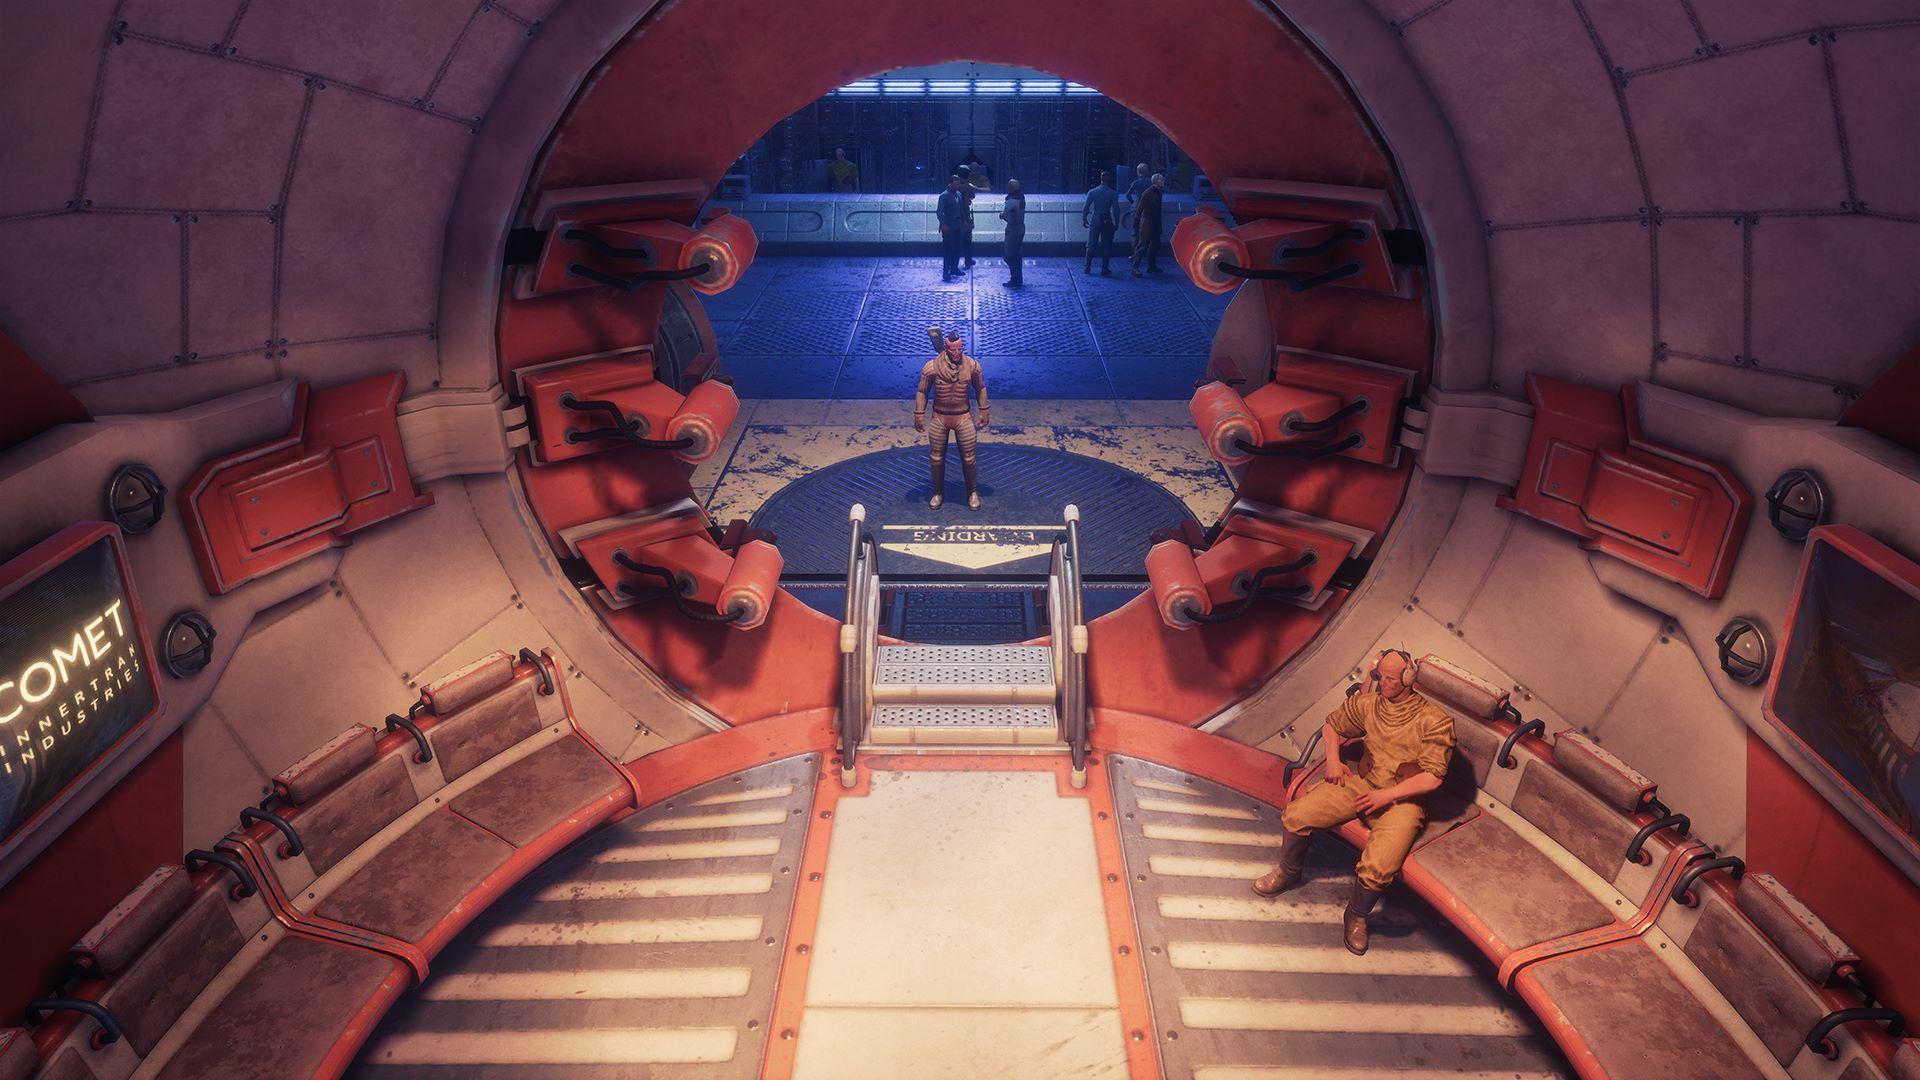 Insomnia: The Ark Screenshot 4 - Bilderquelle: HeroCraft